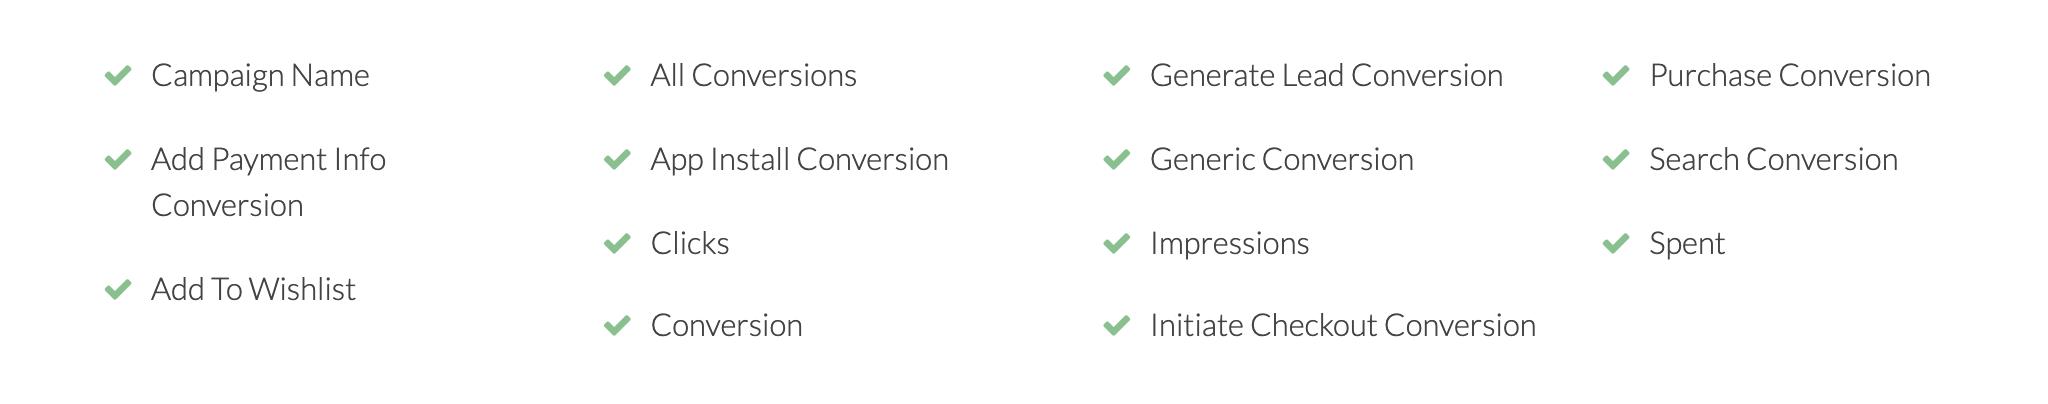 quora metrics and dimensions